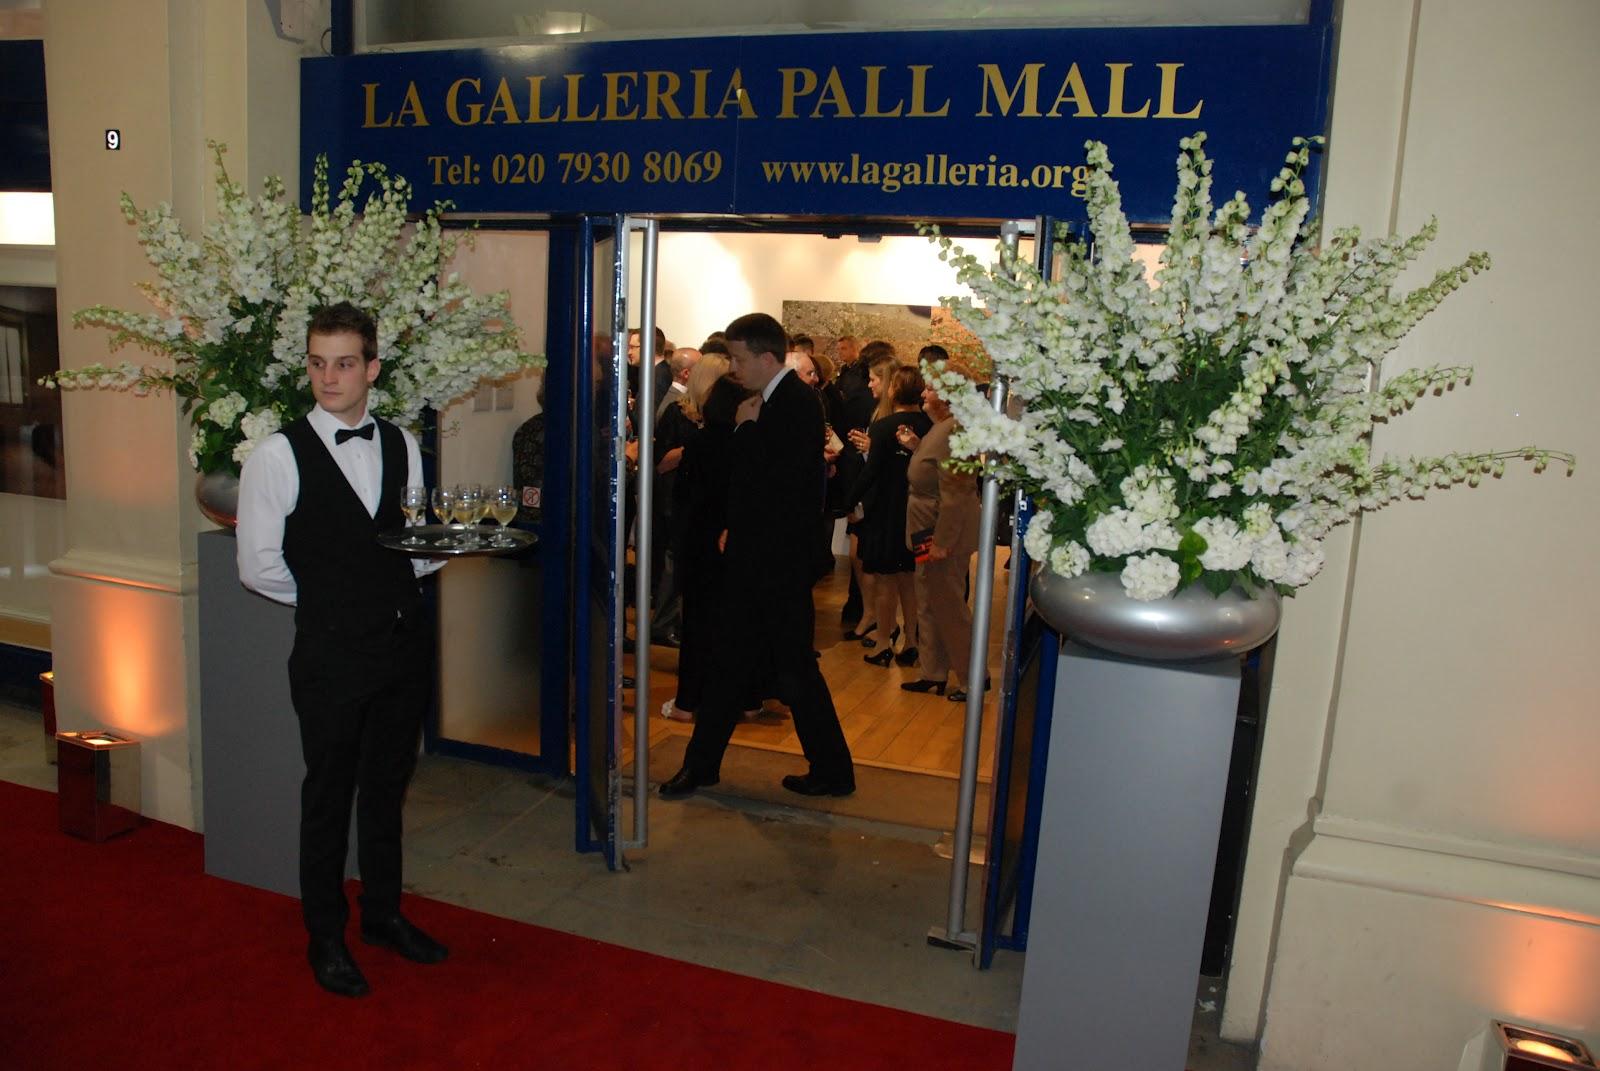 Bilderesultat for la galleria pall mall london